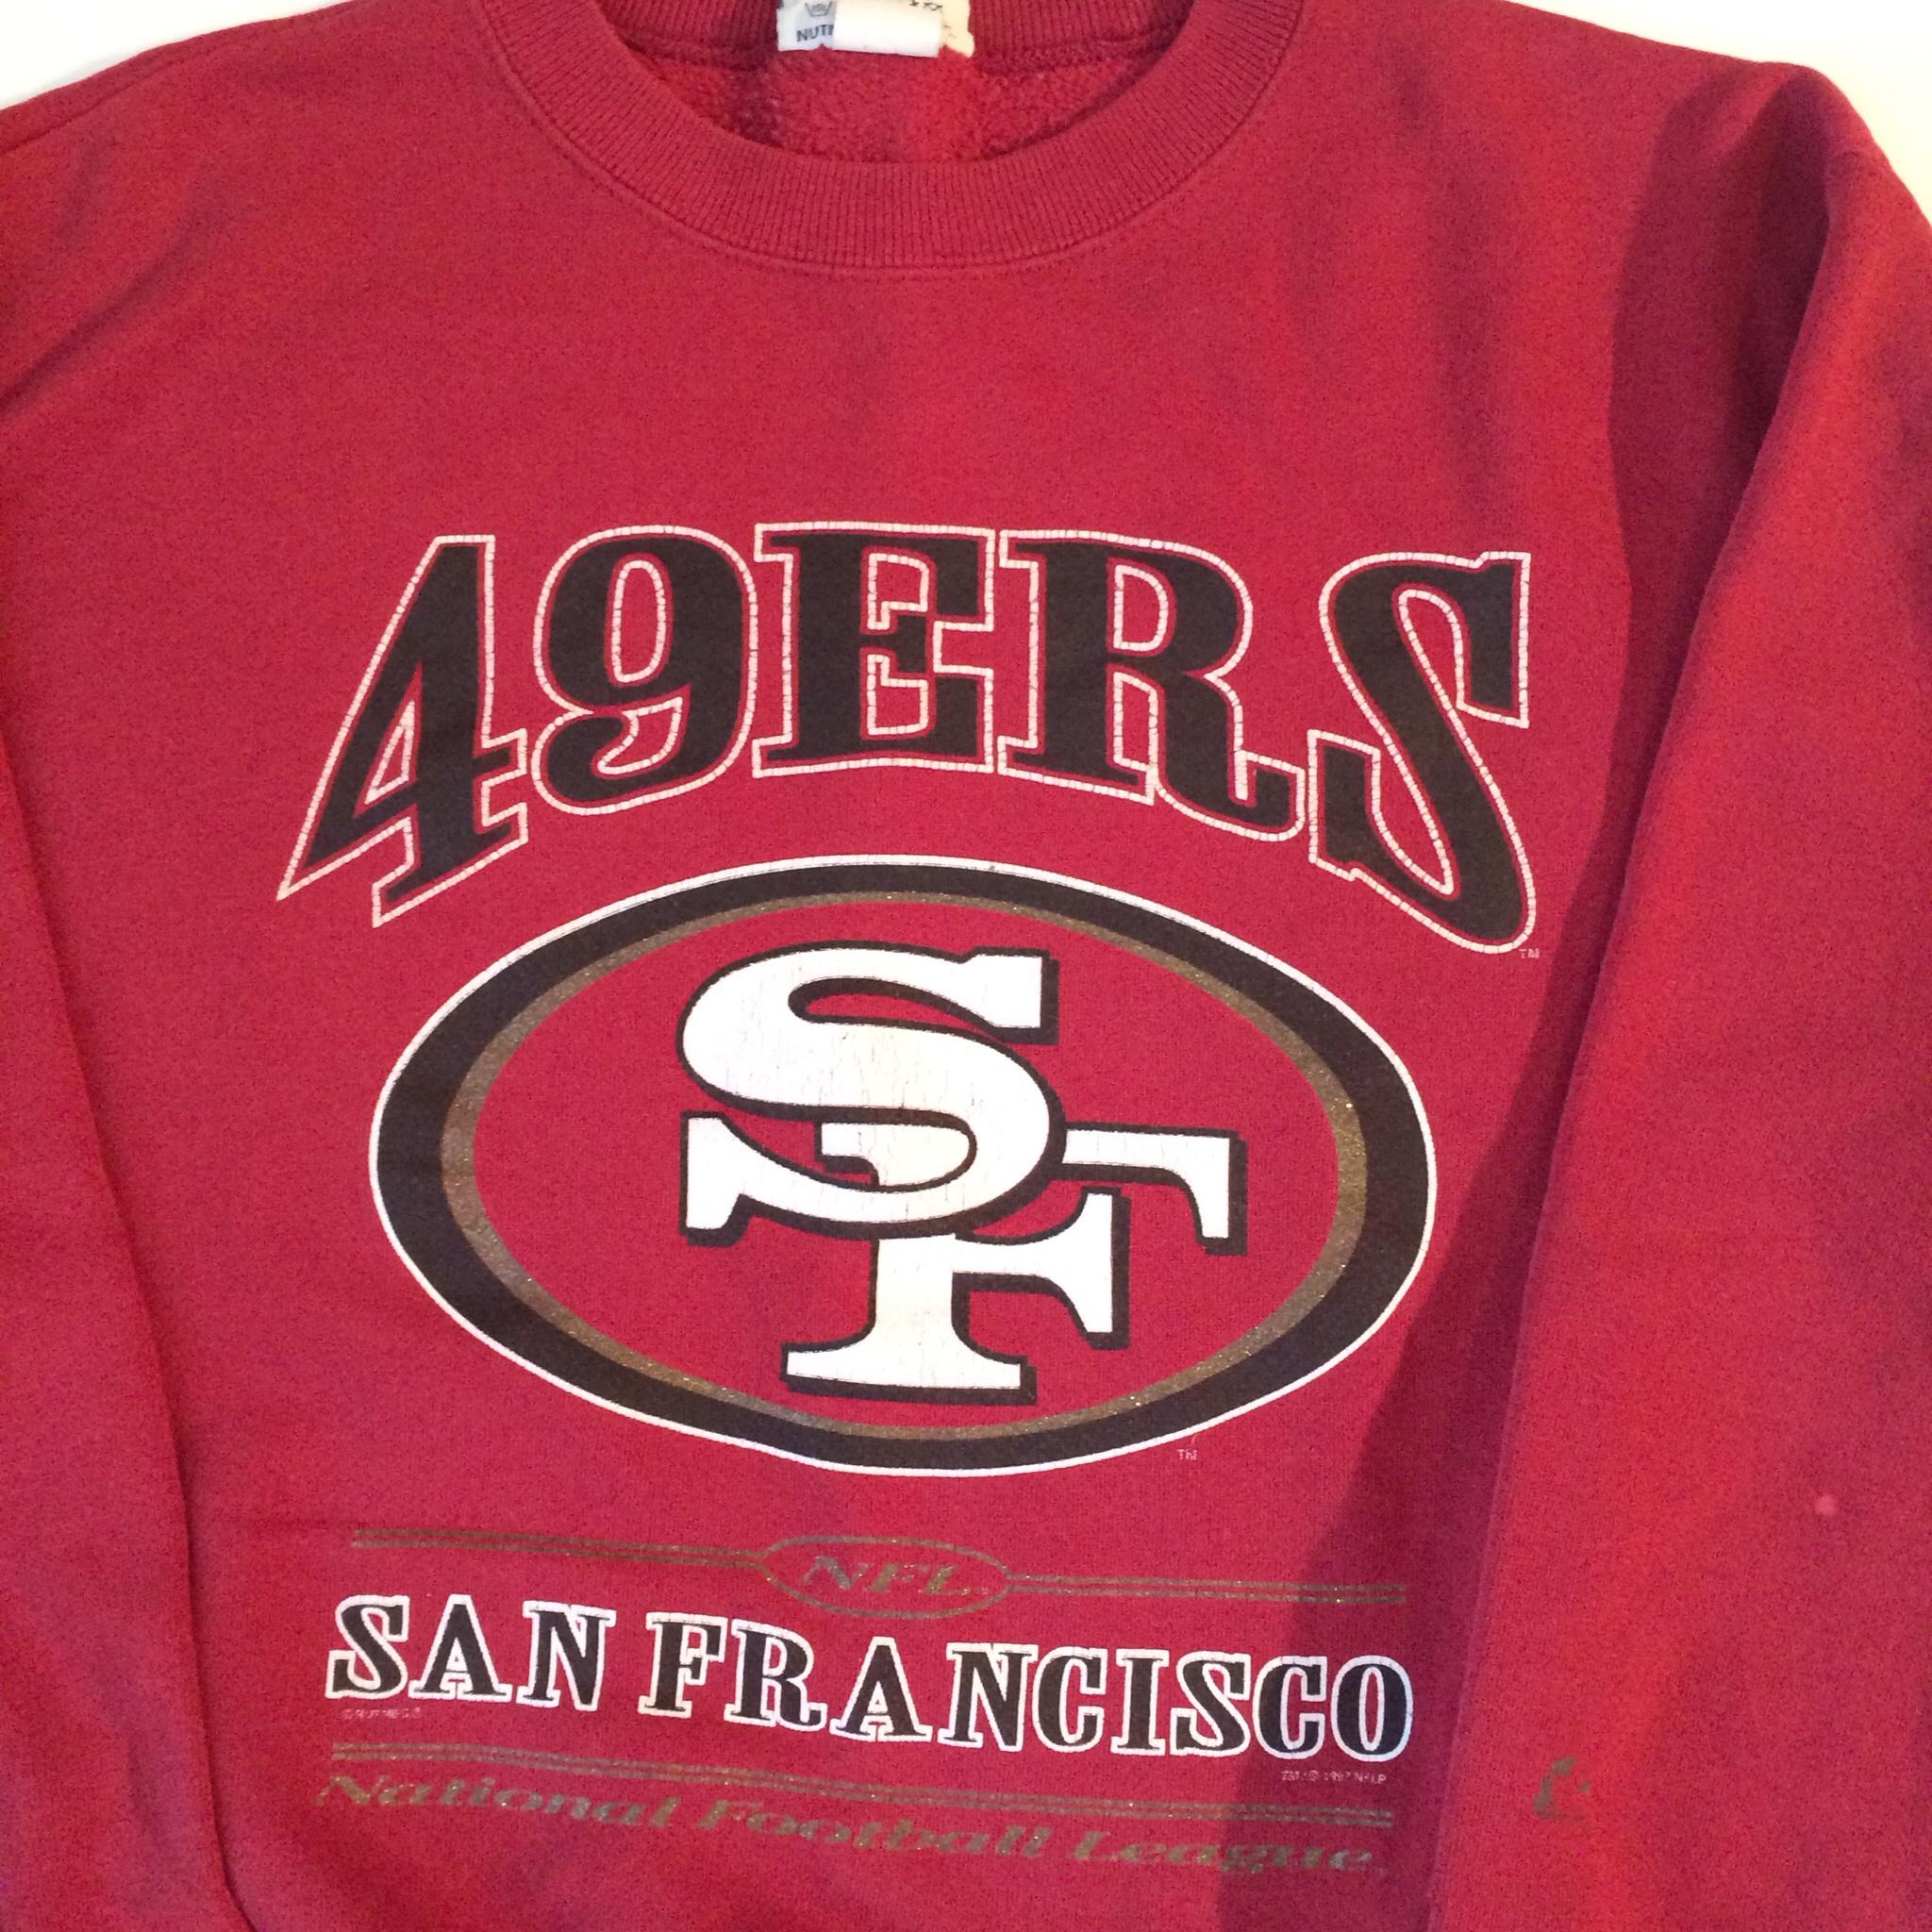 the latest 41c1e 0be00 Vintage Gold Glitter San Francisco 49ers Sweatshirt on Storenvy